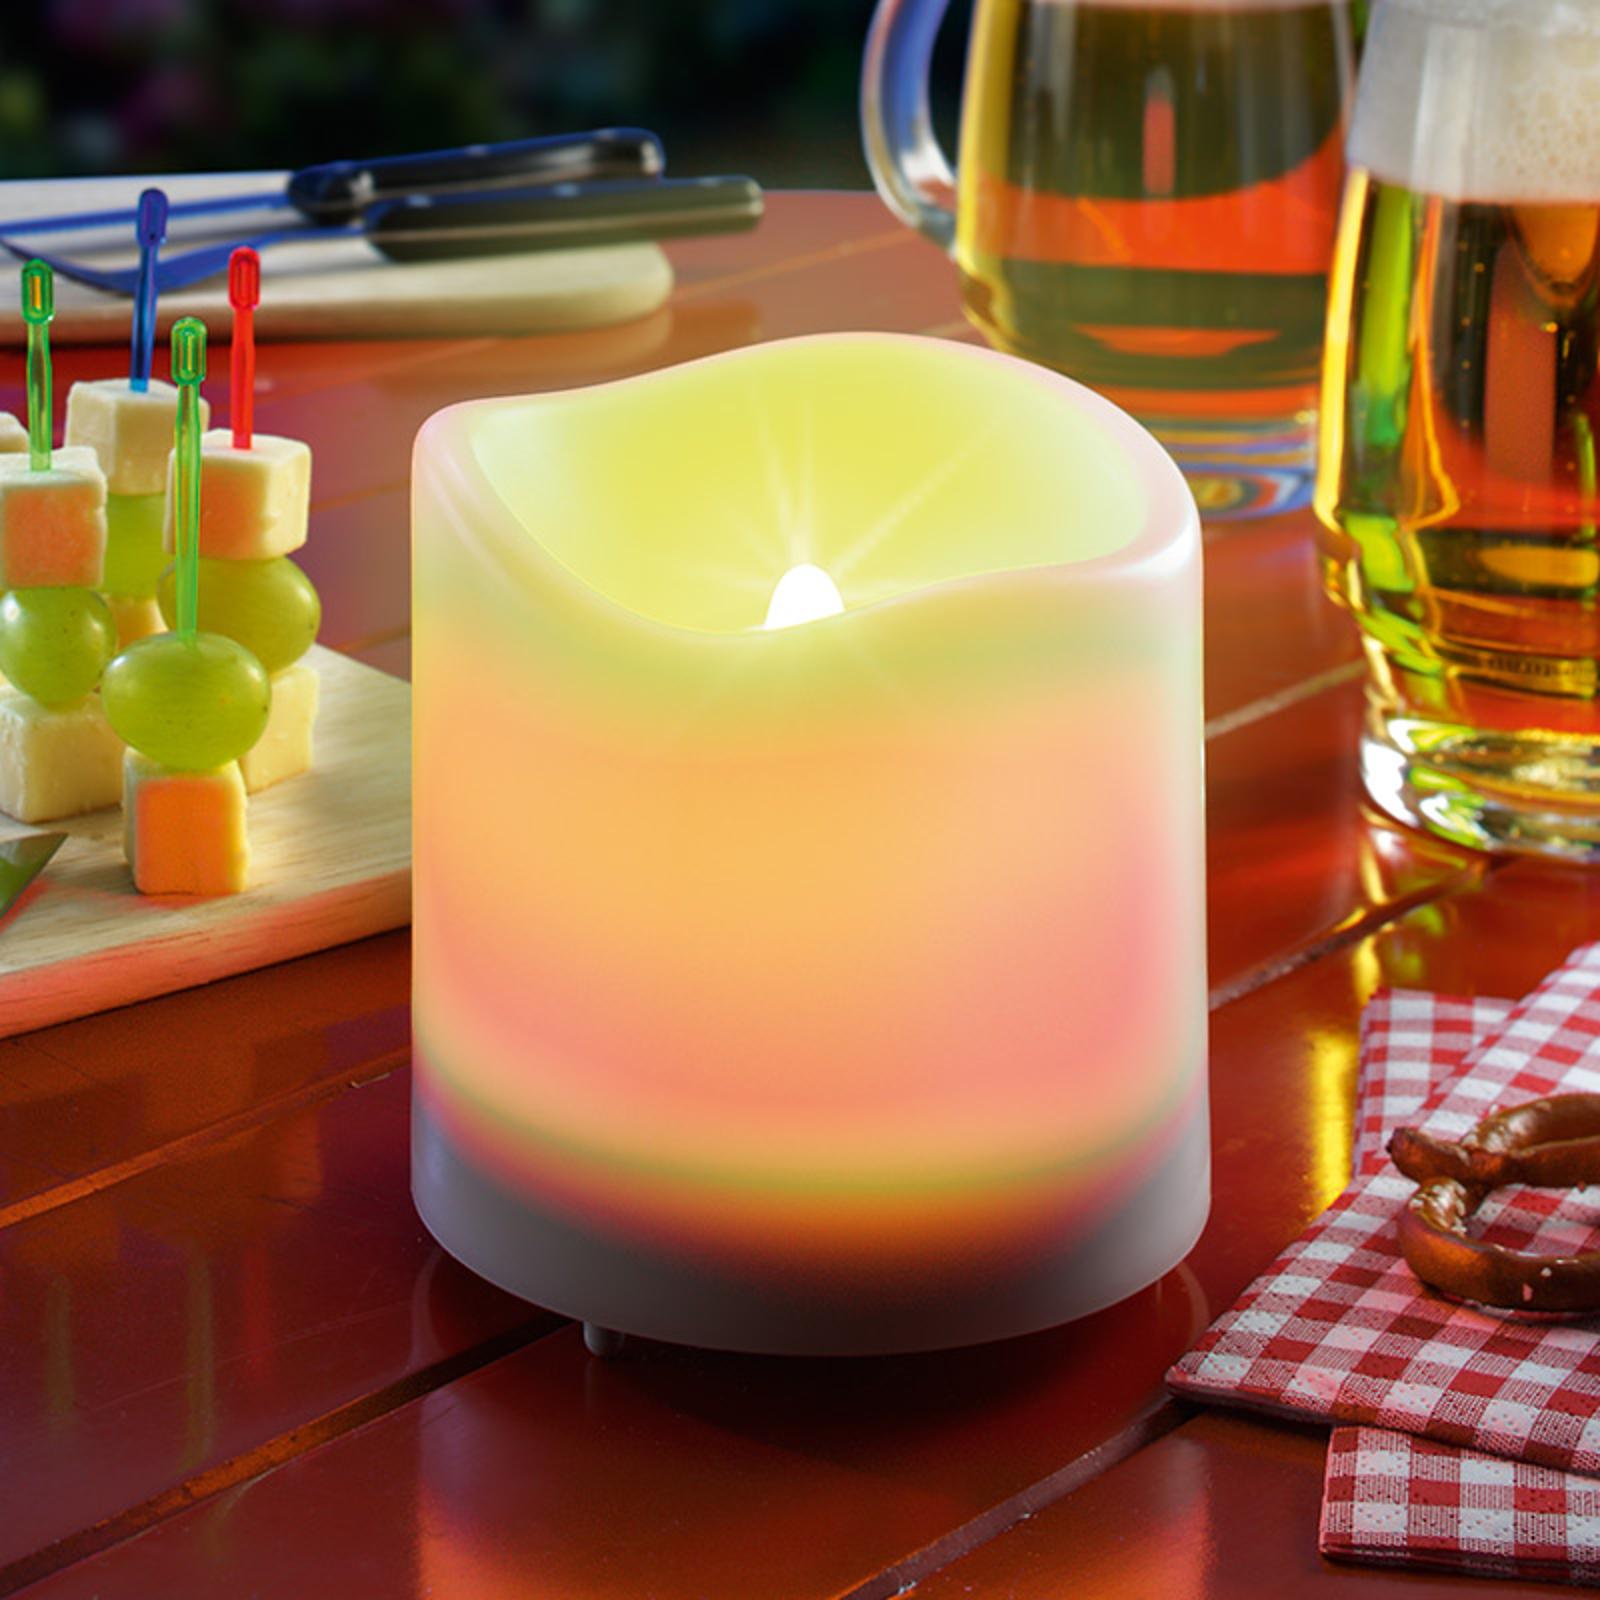 Vela solar LED blanca Candle Light